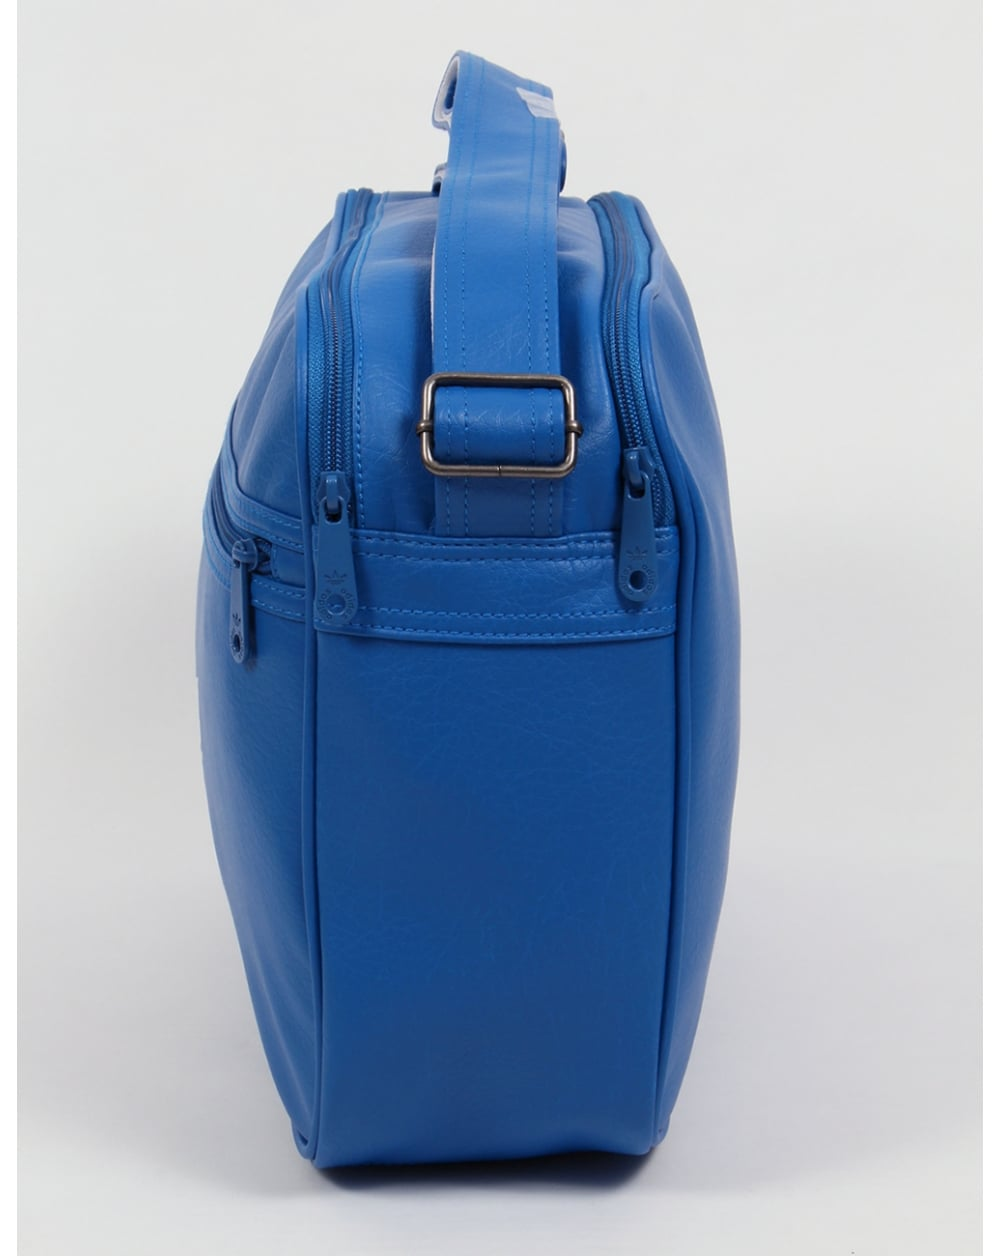 e47297cd005 Adidas Originals Airliner Adicolor Bag Bluebird Blue,shoulder,holdall